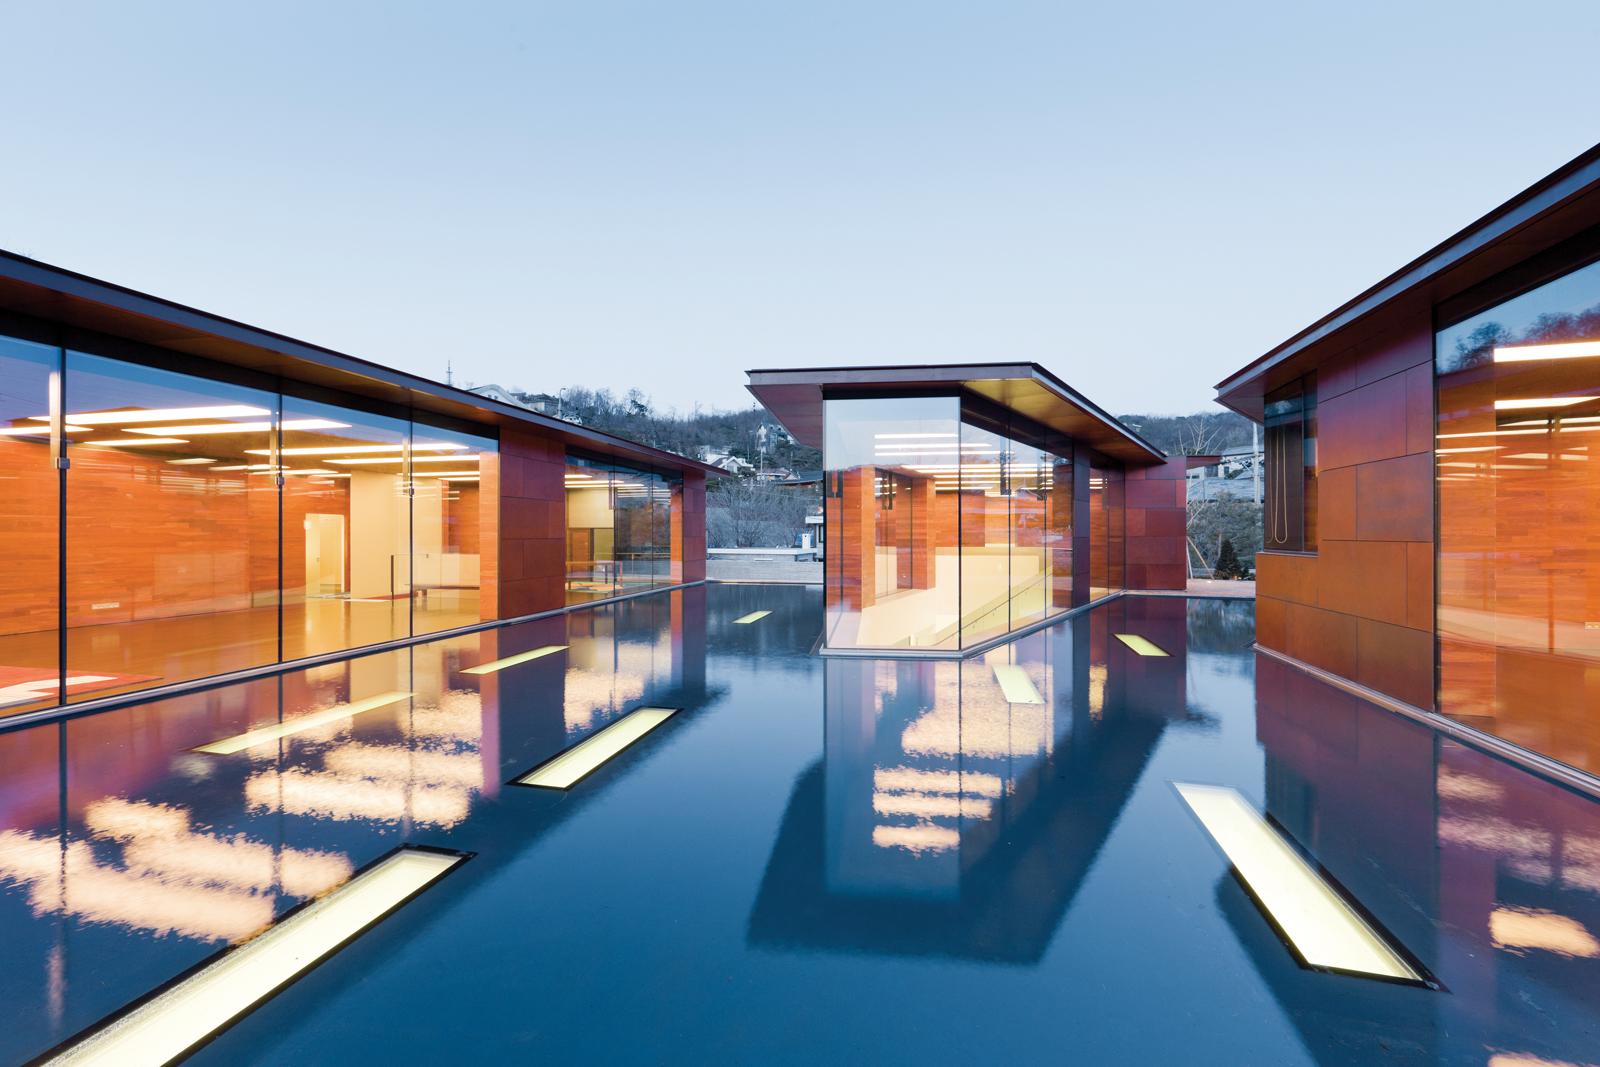 Pool gallery Seoul